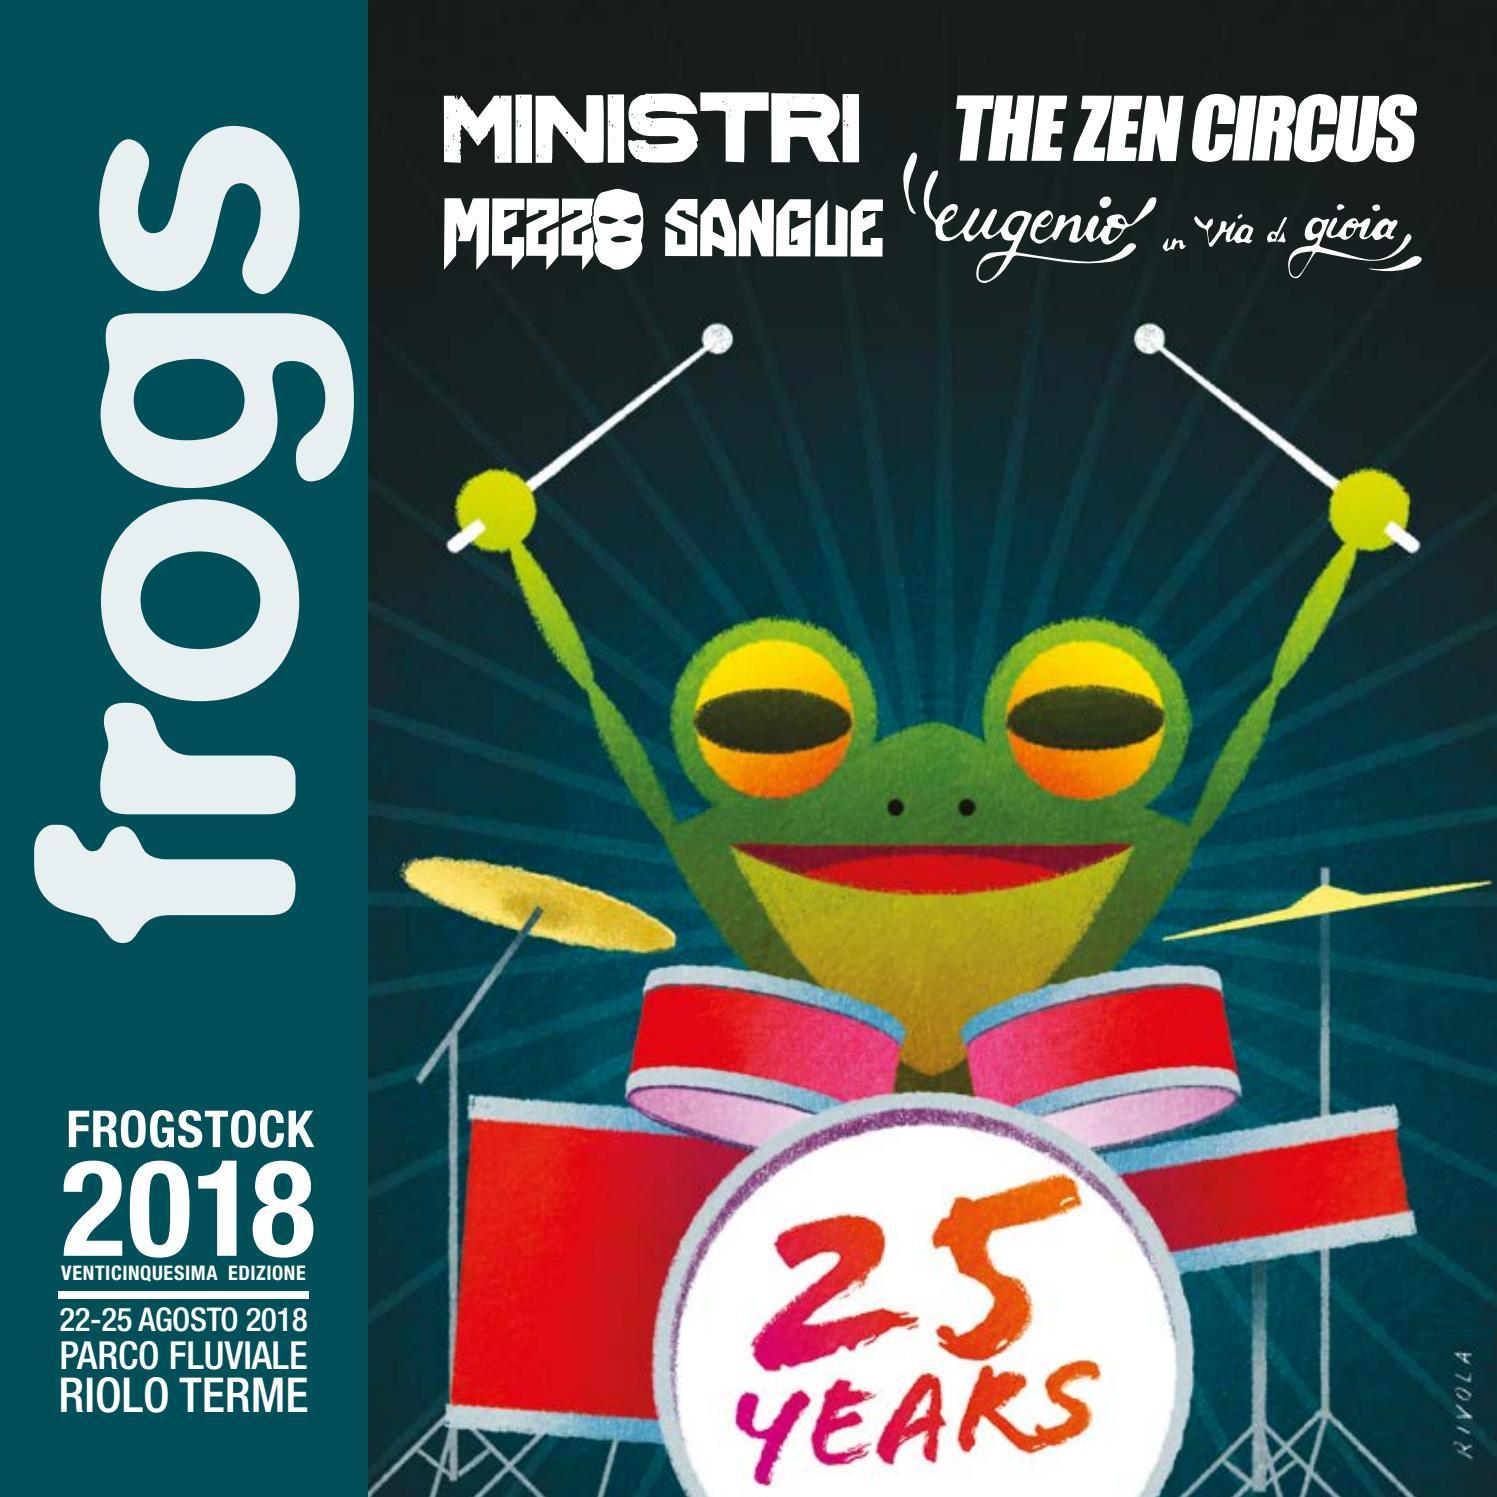 Frogs Frogstock 2018 By Frogstock Issuu